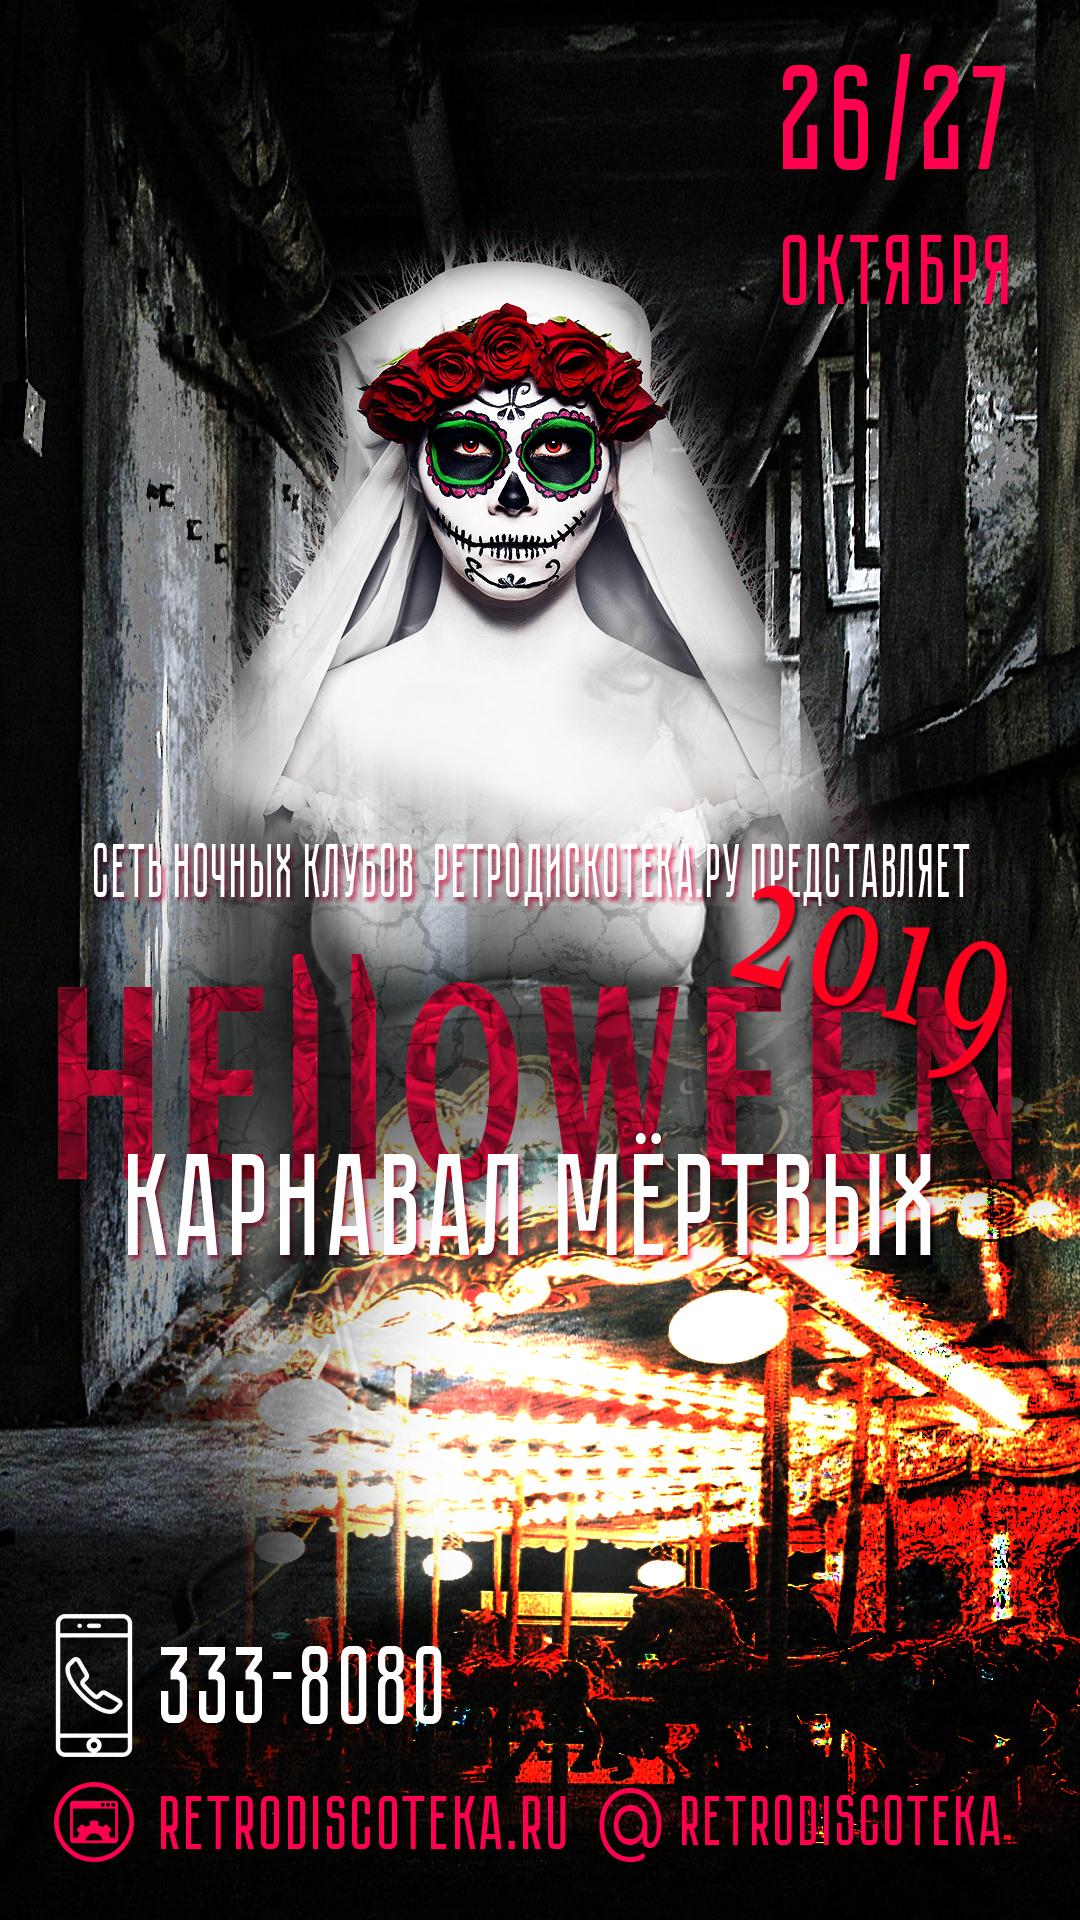 Дизайн афиши Хэллоуин 2019 для сети ночных клубов фото f_3075c6da612750e8.jpg